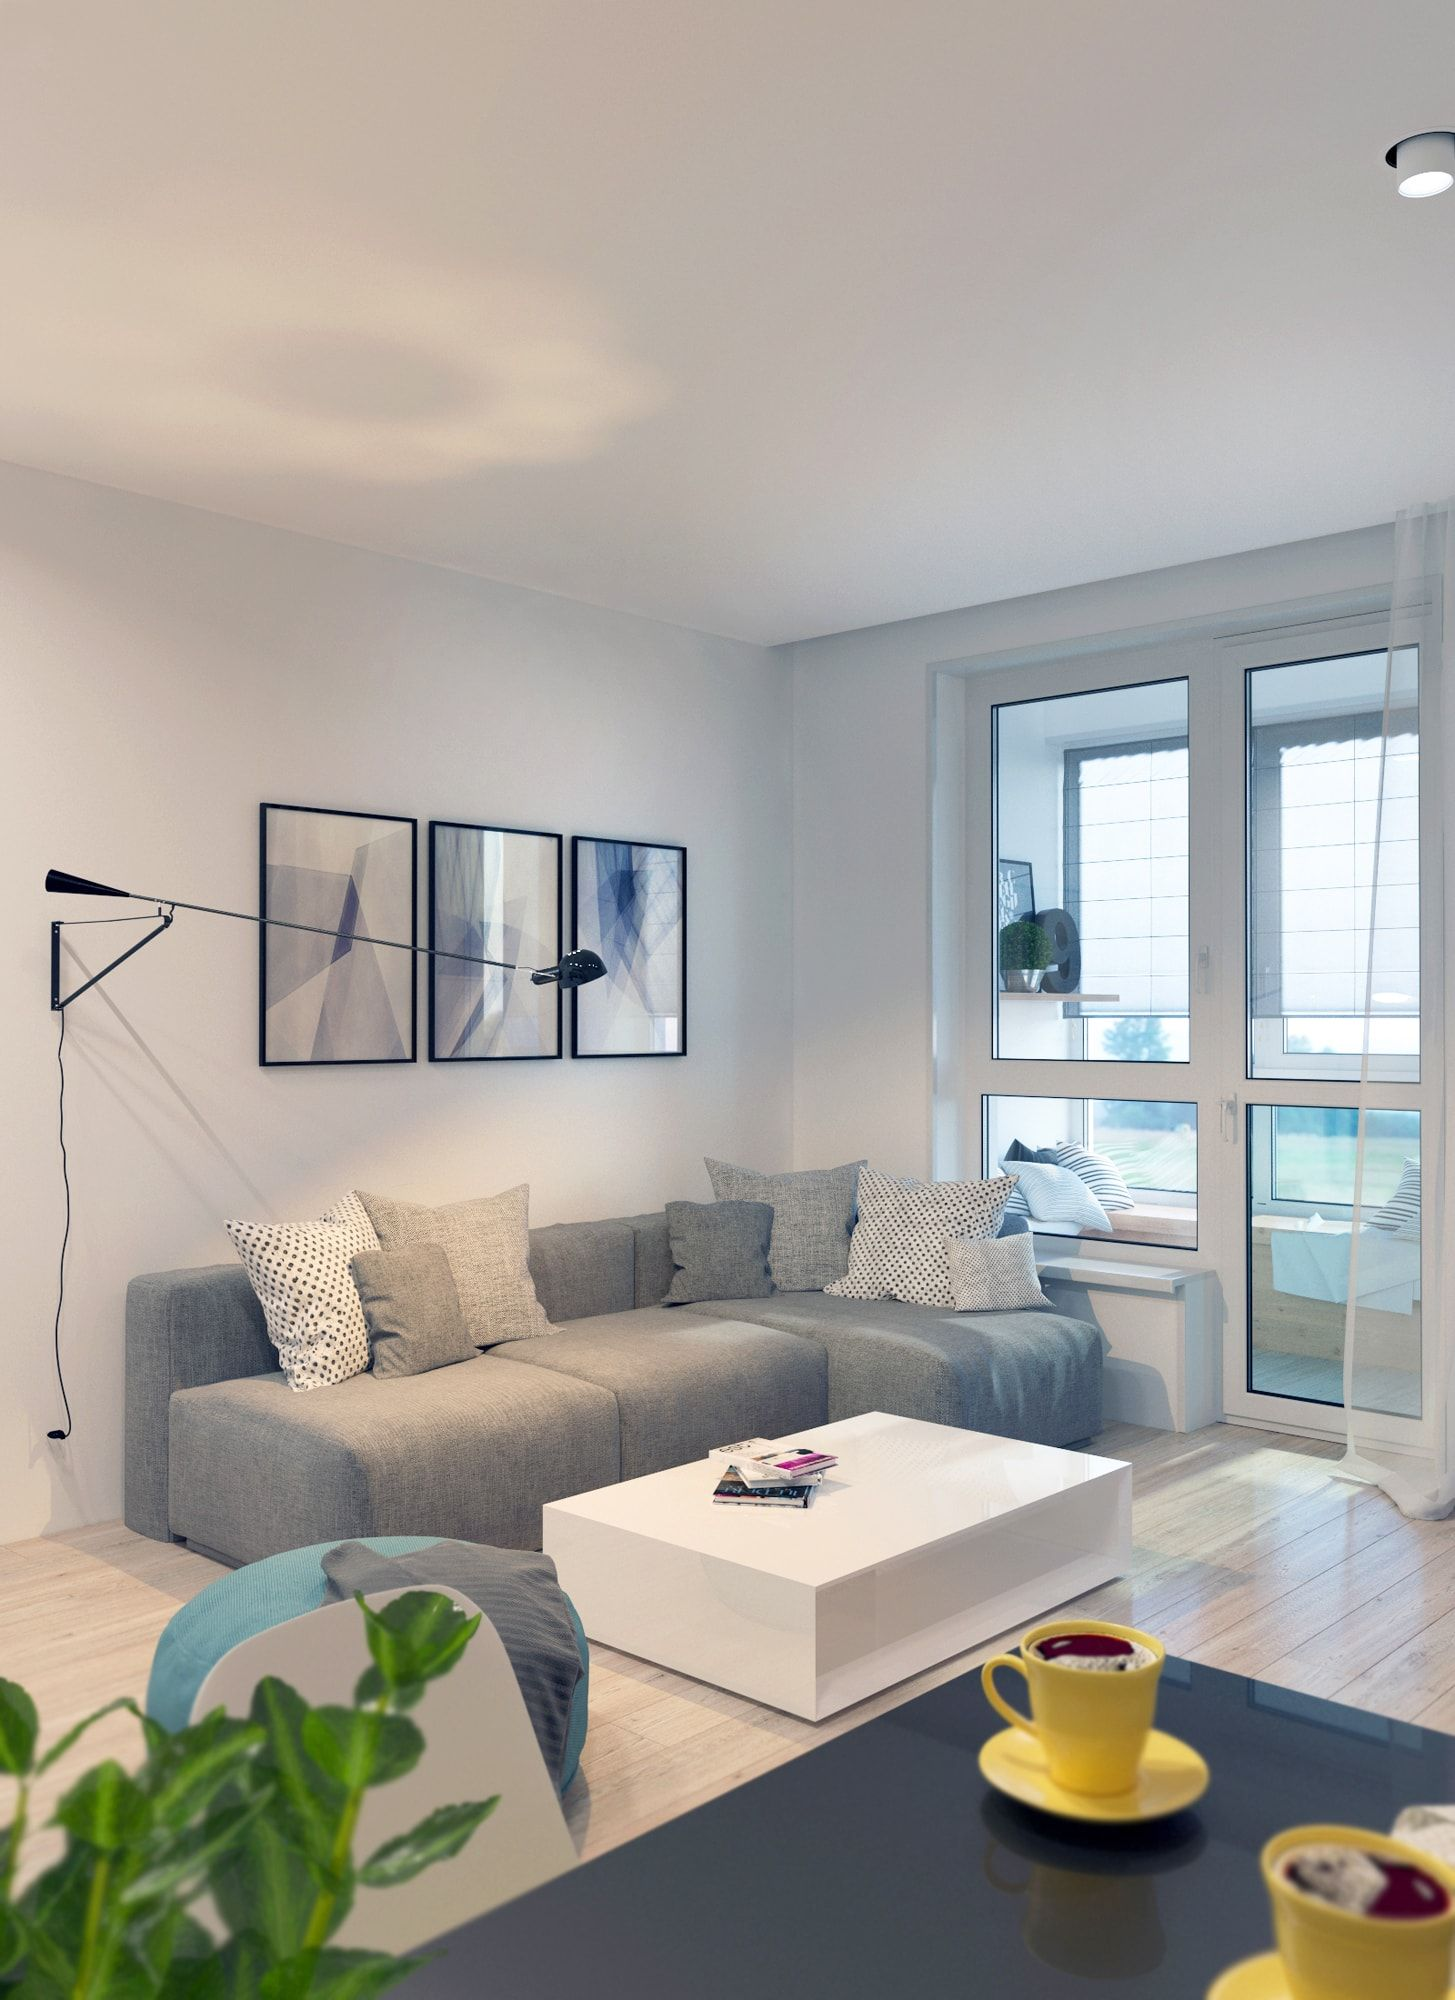 Cozy condo living rooms zikzak  Апартаменты для души  Квартира моя  pinterest  living